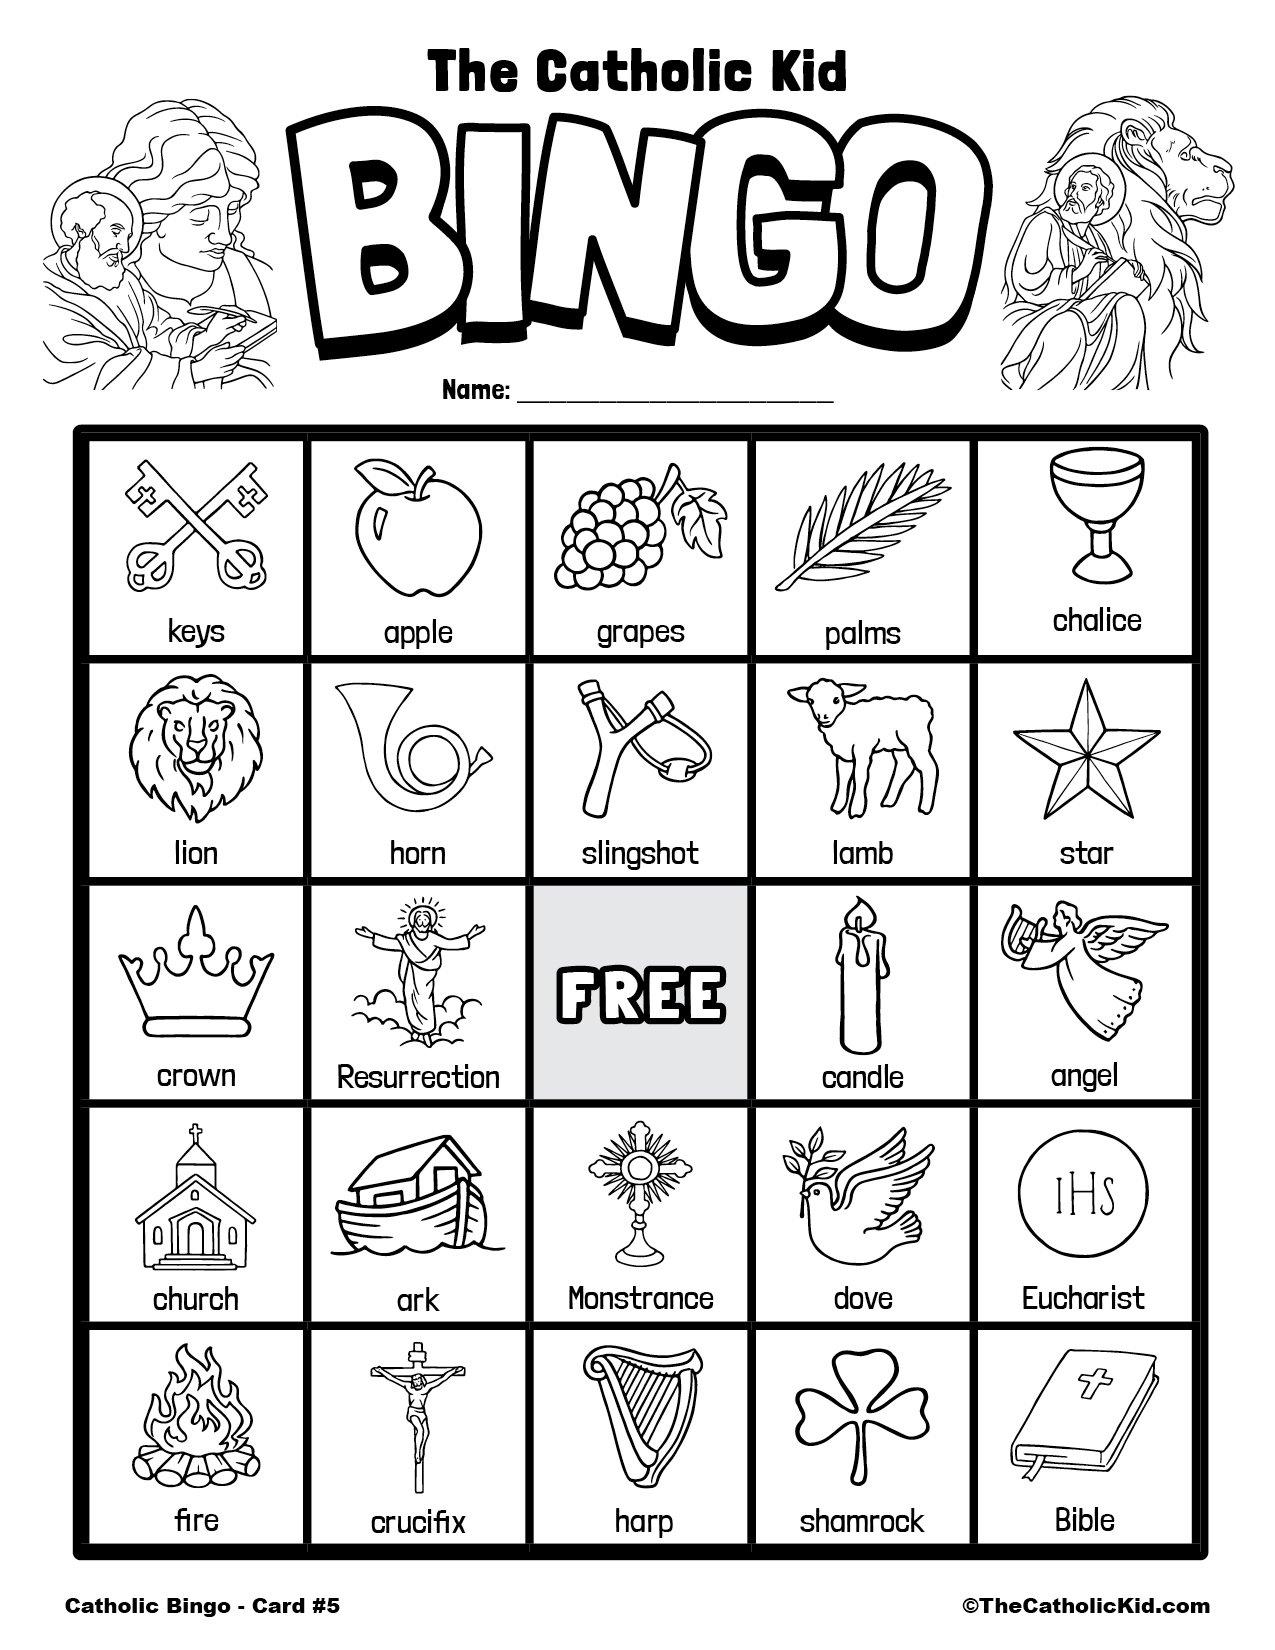 Free Printable Catholic Bingo Game Card - 5